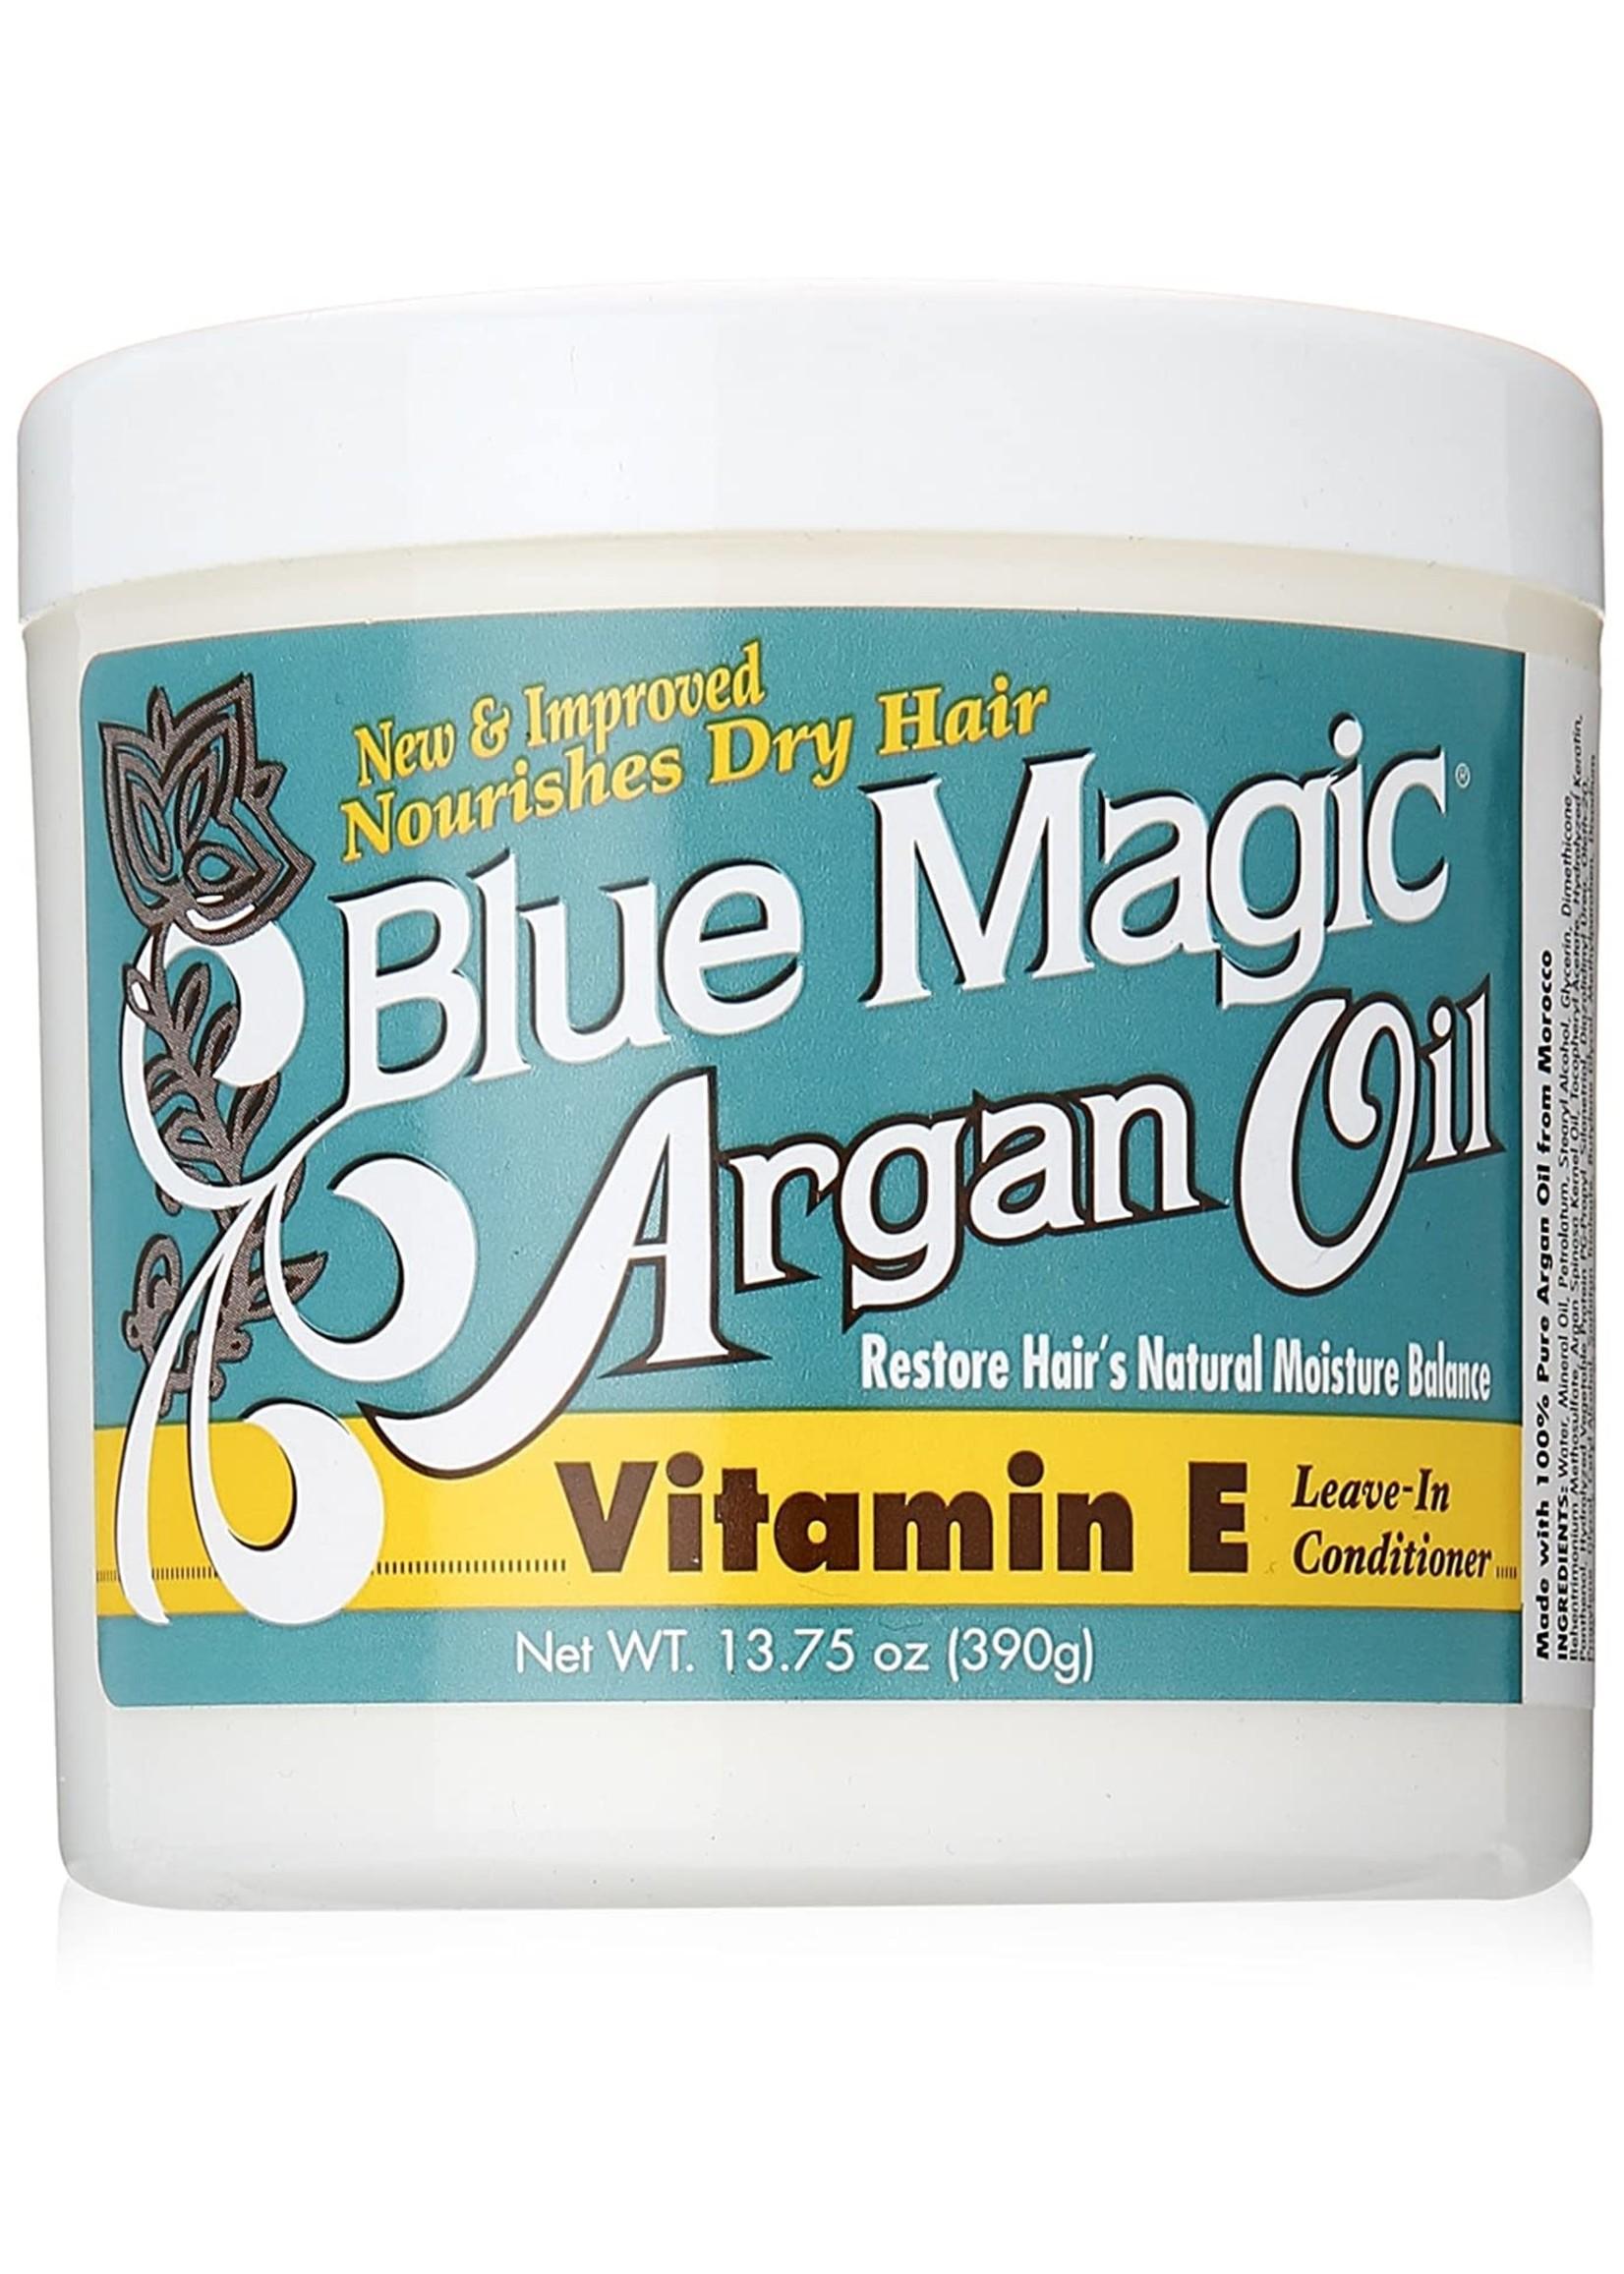 Blue Magic Argan Oil Vitamin E